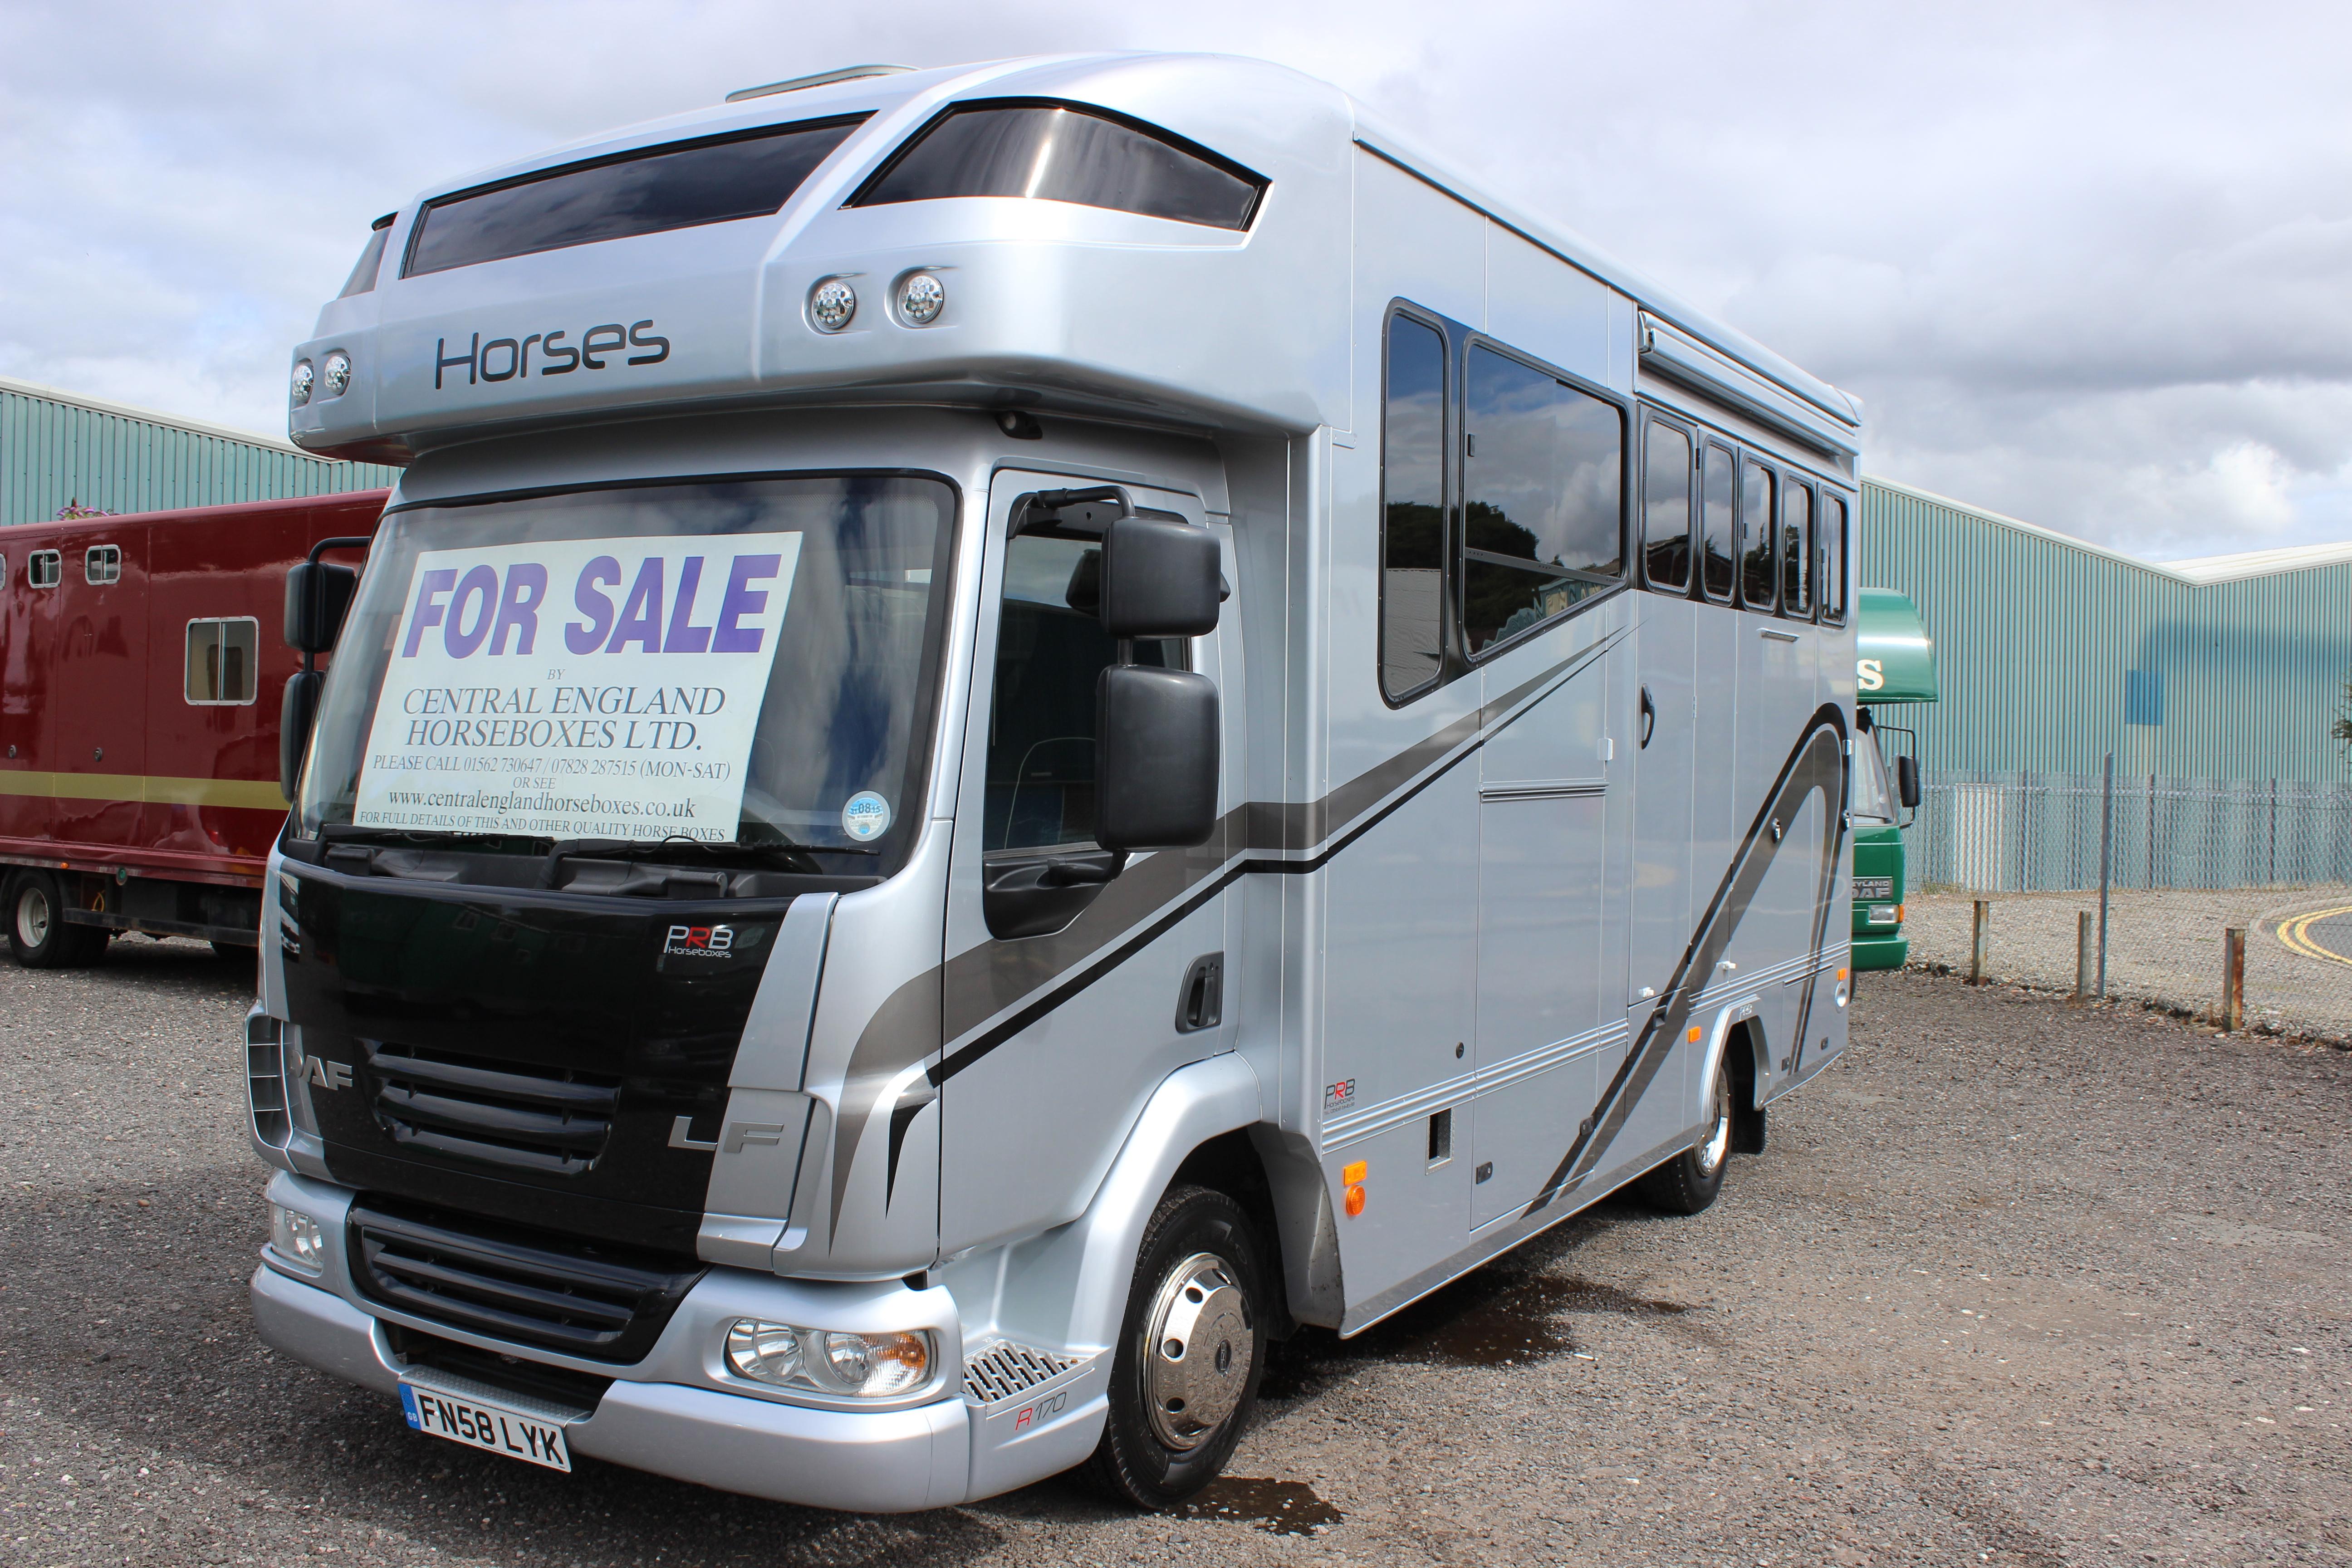 Luxury Prb R170 7 5t Horsebox For Sale Euro 4 Compliant